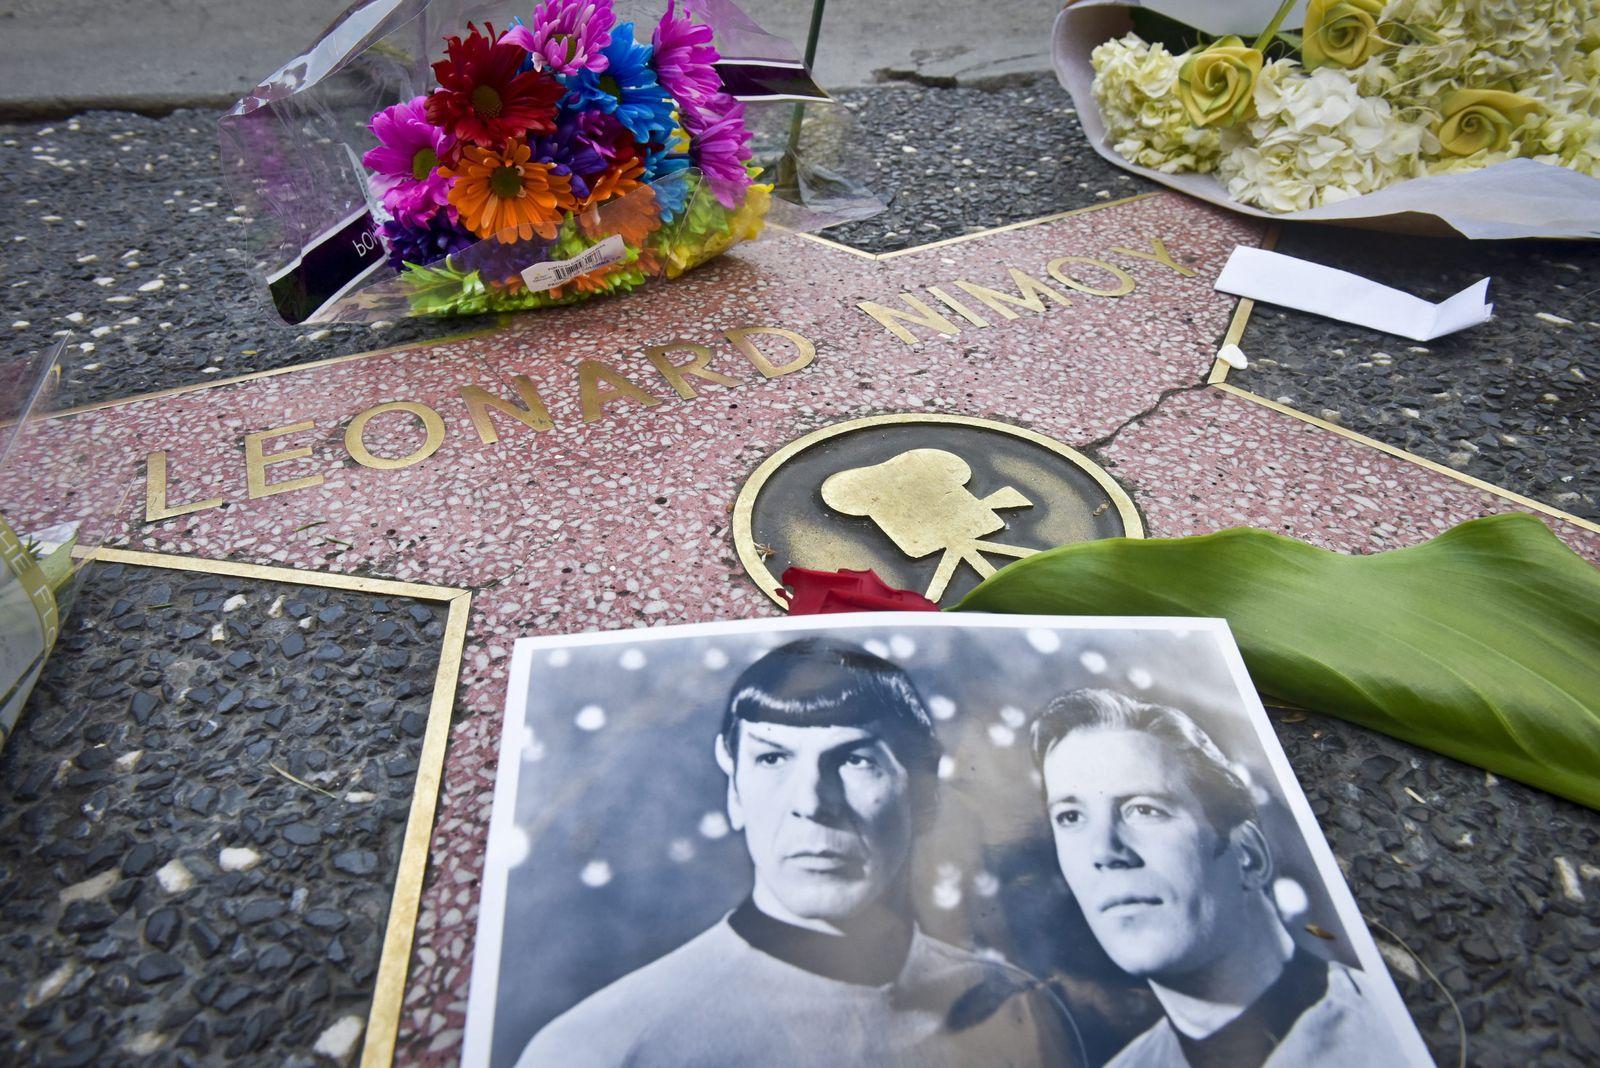 Leonard Nimoy Star Treks Mr Spock dead at 83